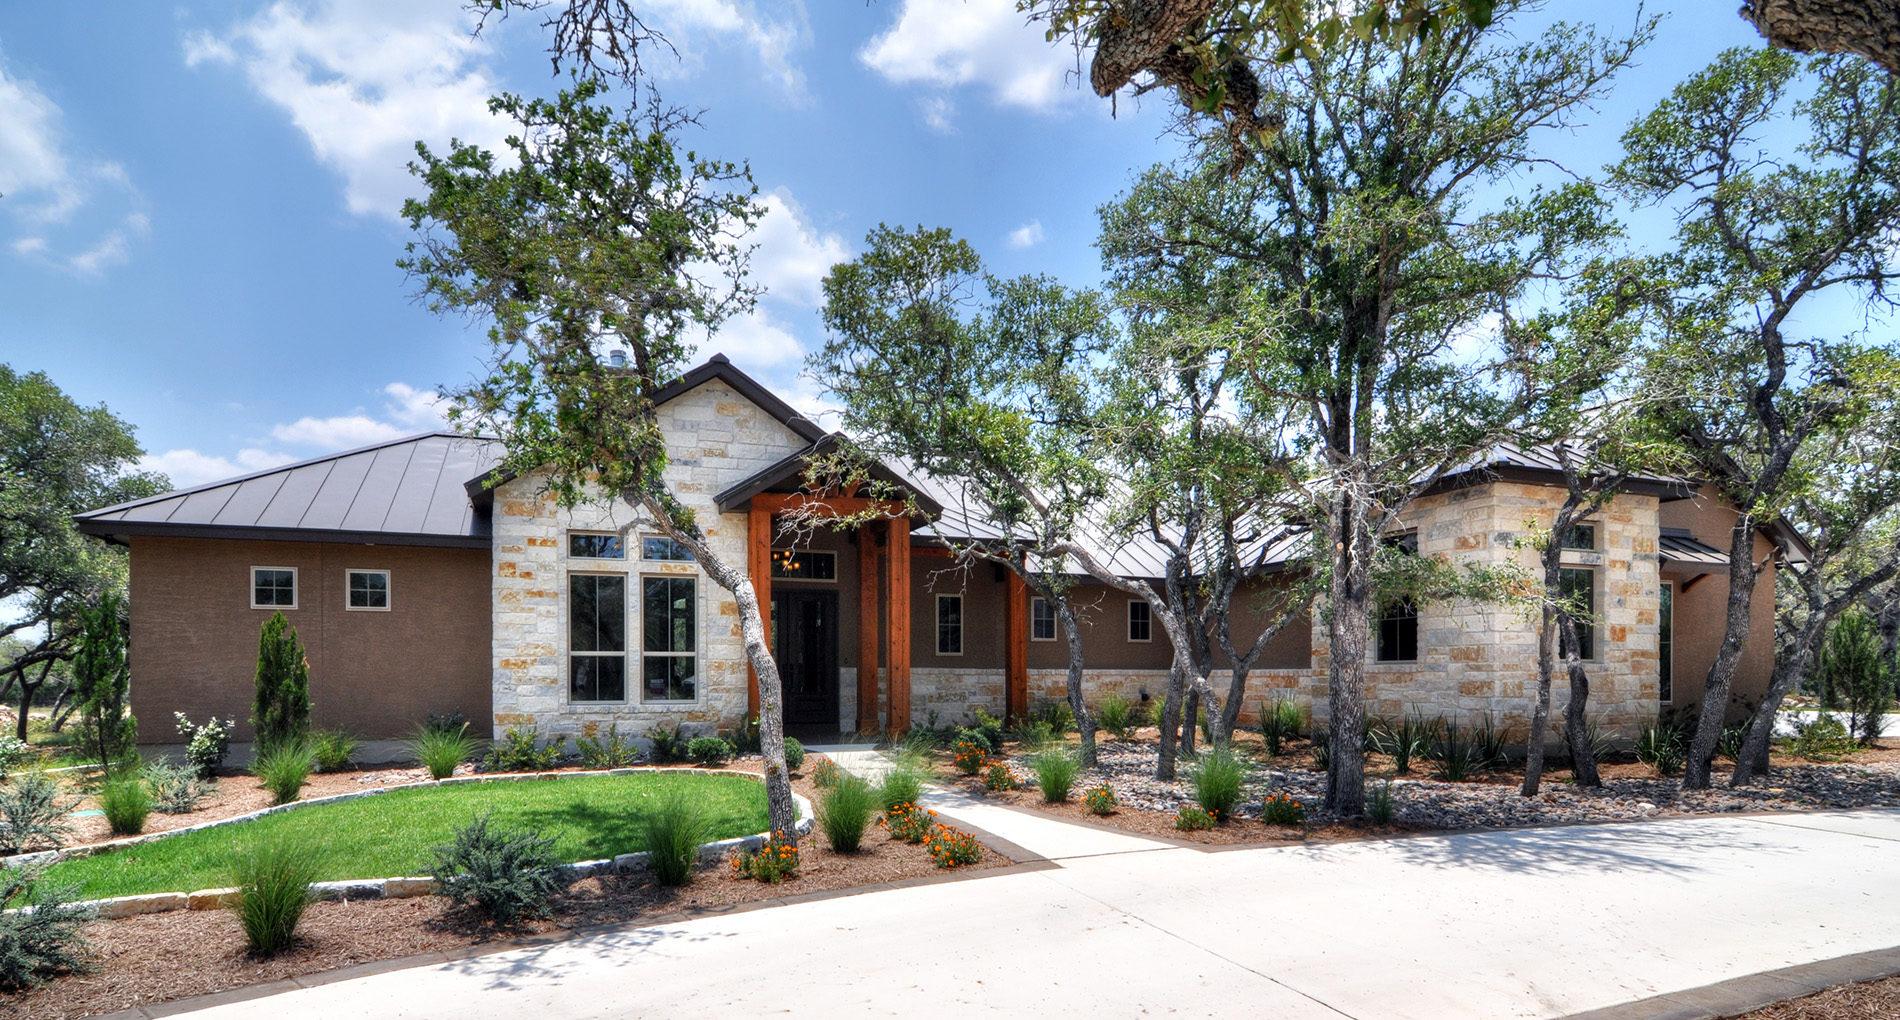 Custom Home Builders in New Braunfels, TX | Alair Homes New Braunfels